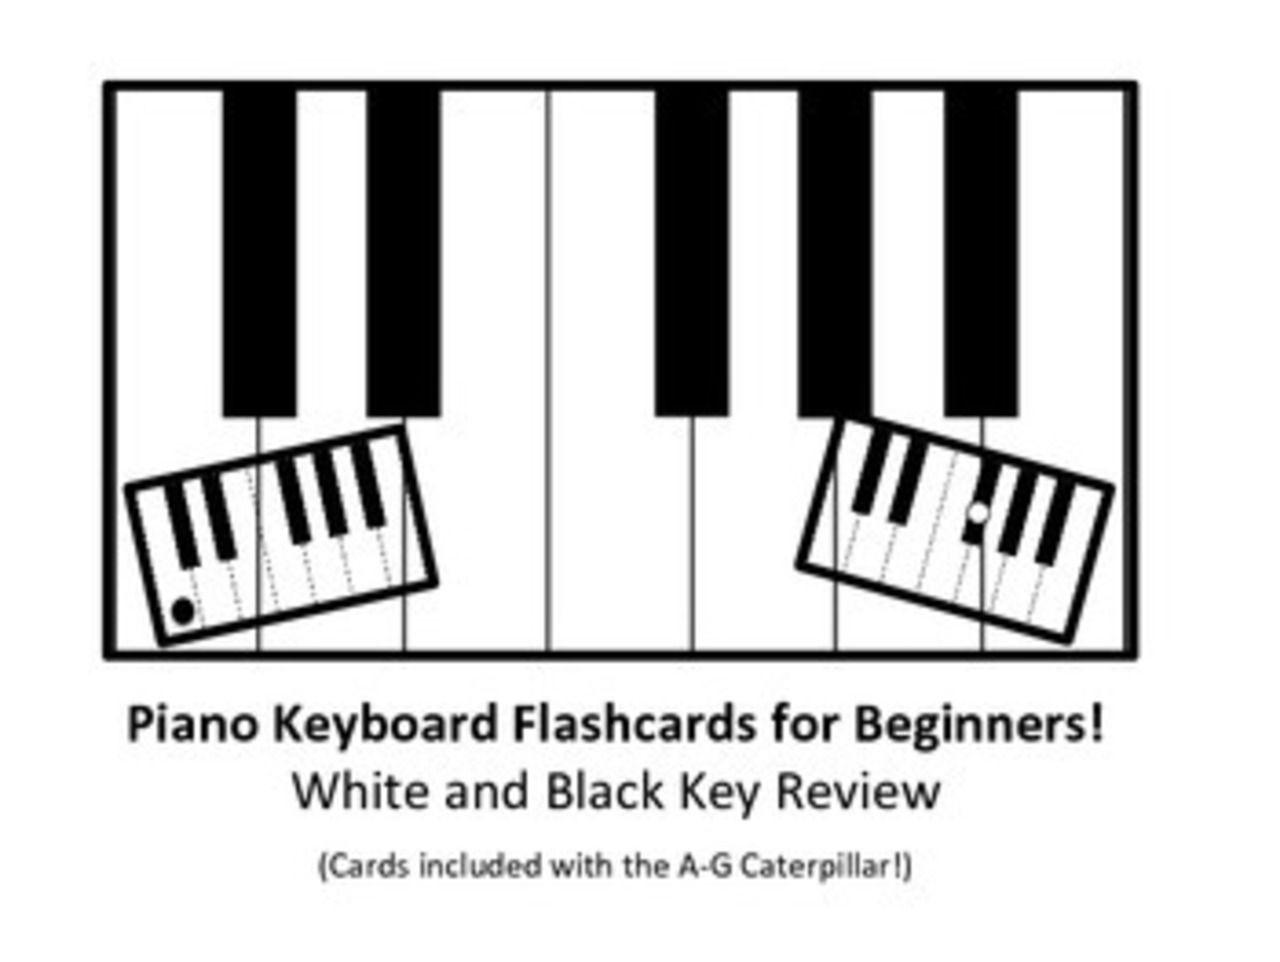 Piano Keyboard Flashcards Flashcards Blues Piano Keyboard Lessons